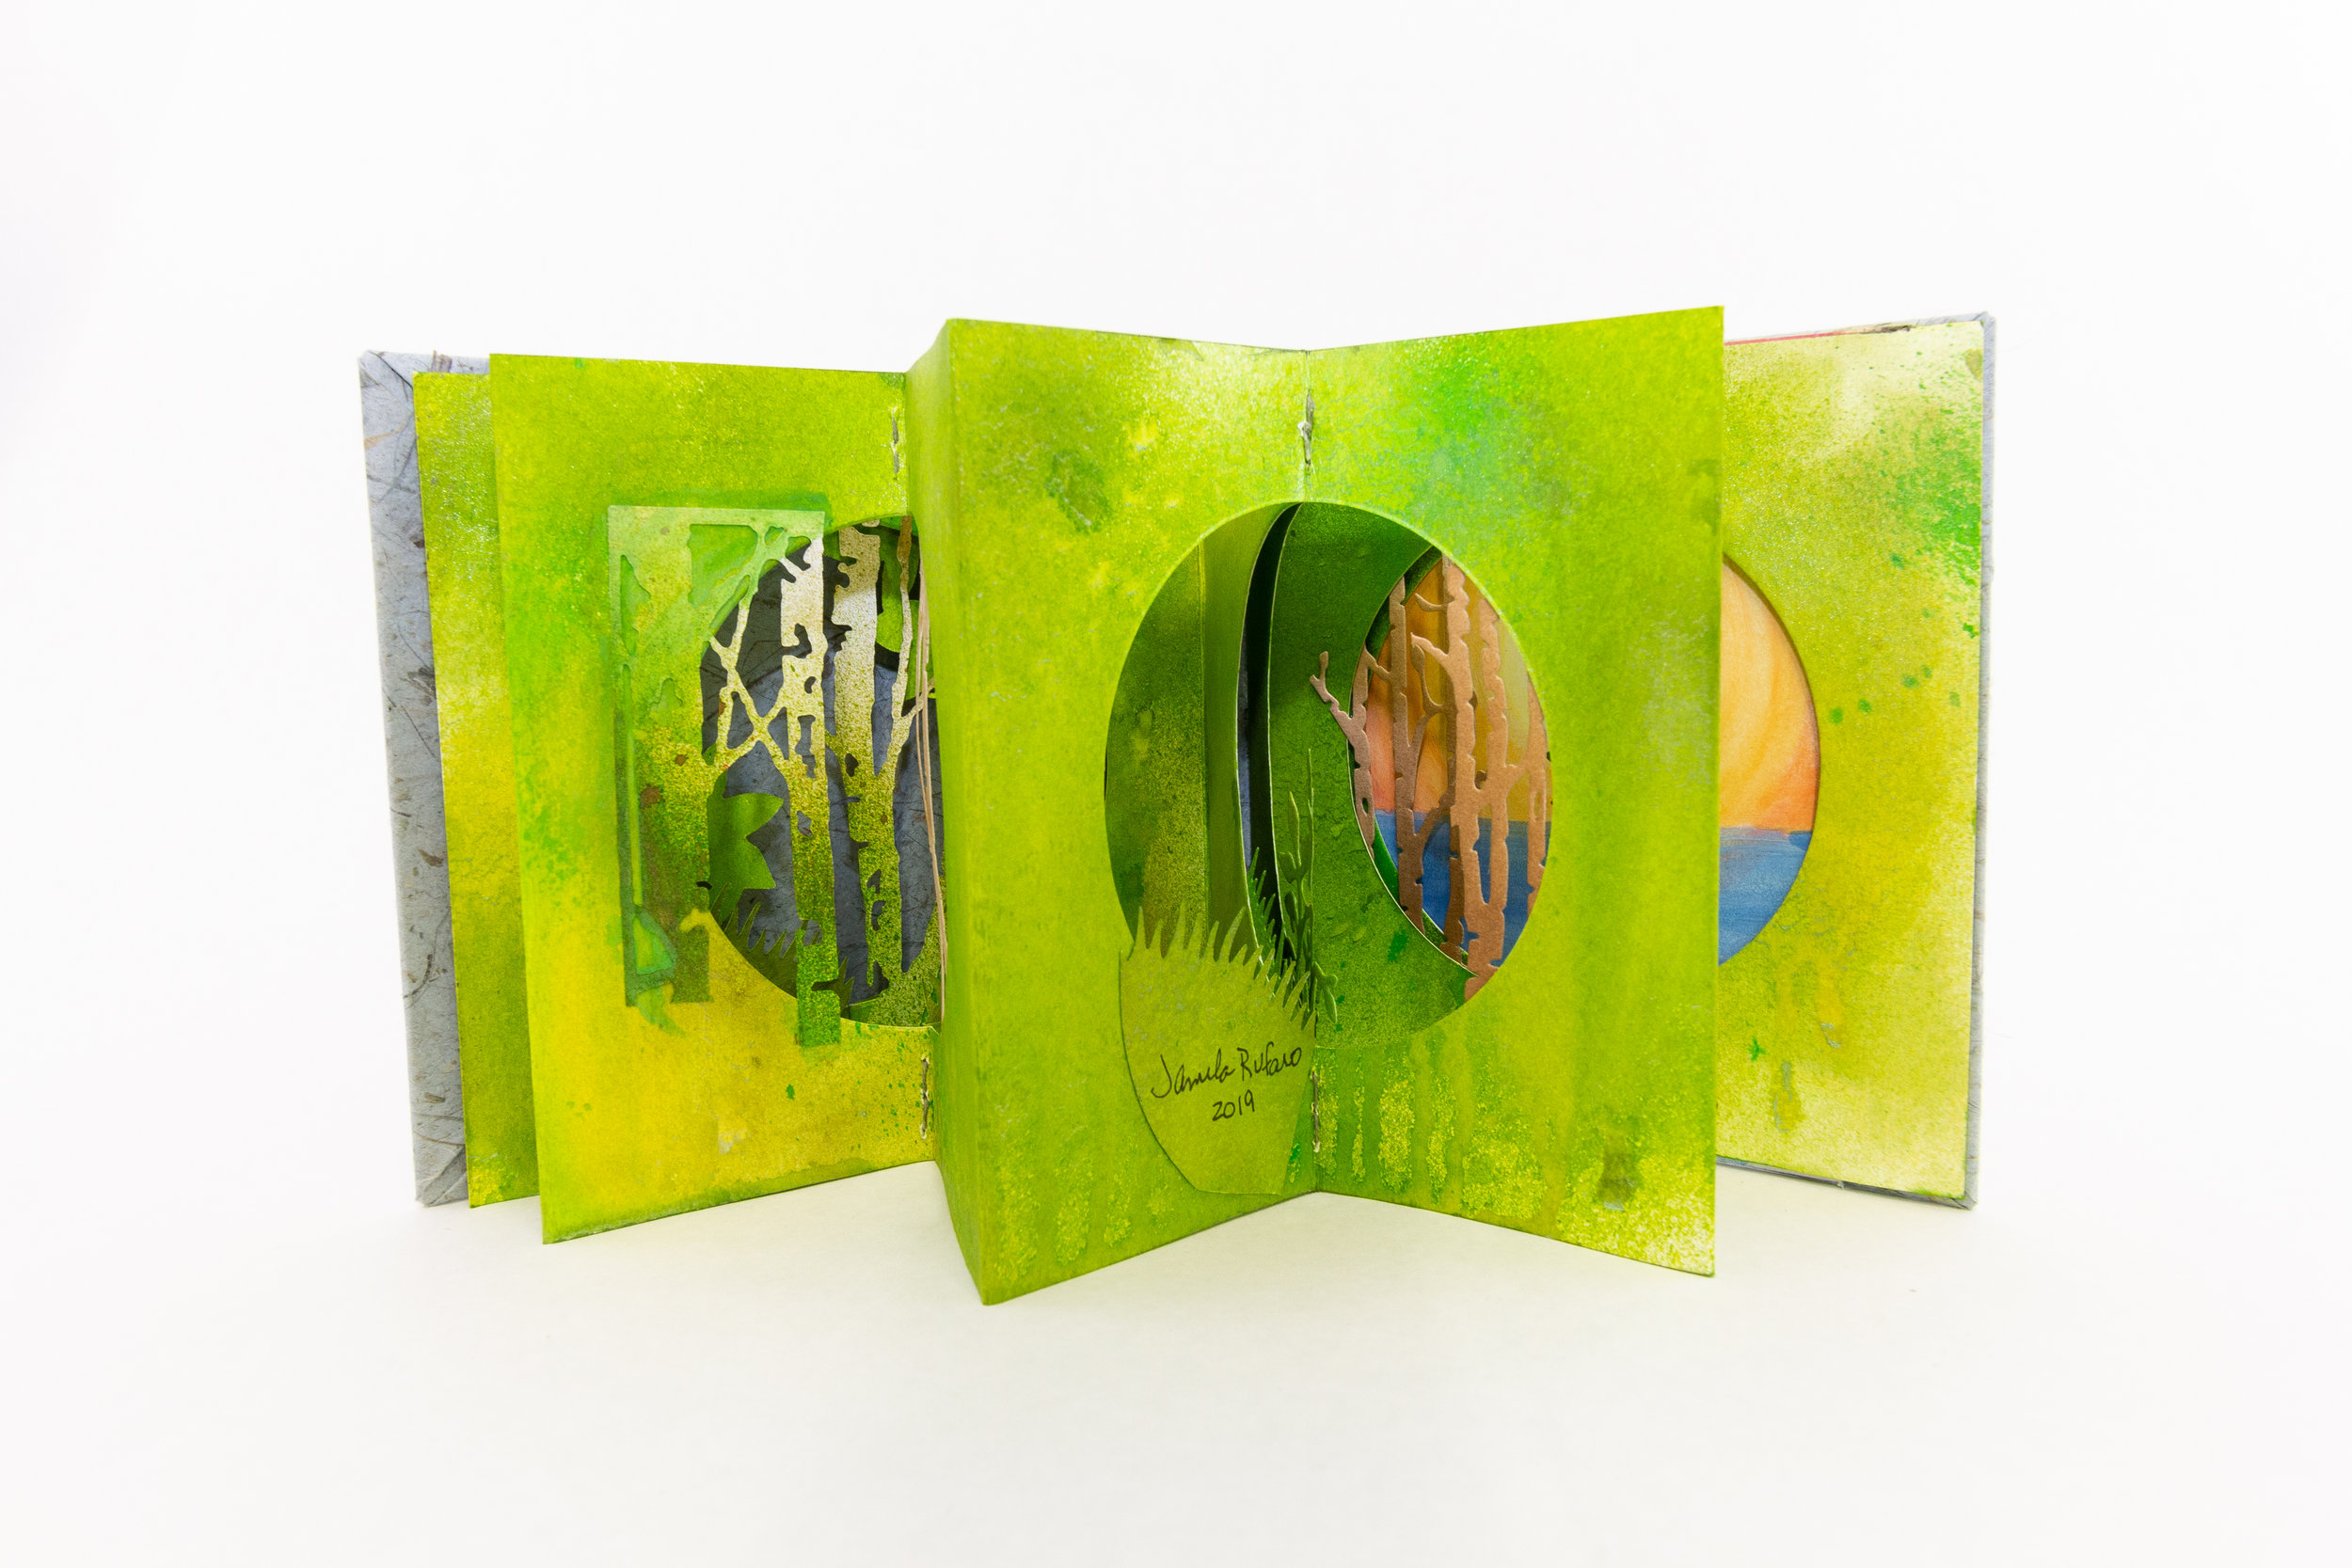 Jamila Rufaro,Double Accordion Tunnel Book, Mixed Media, paint, ink, watercolor, 2019, $180, Palo Alto, CA